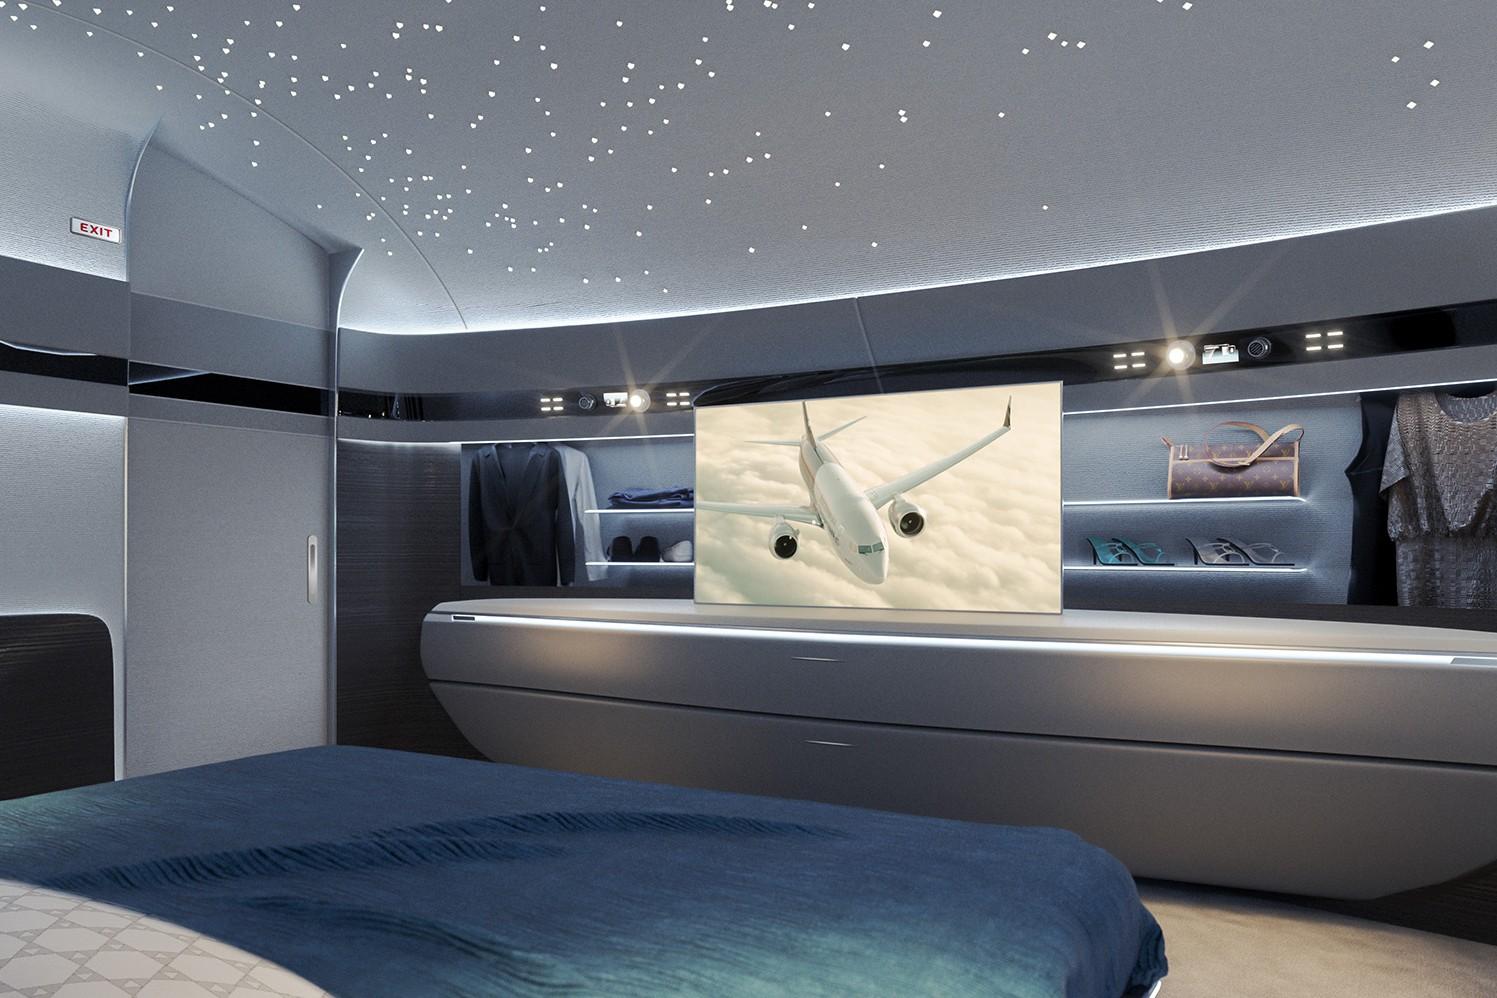 Luxury private jet interiors: top bedrooms in 2020-2021